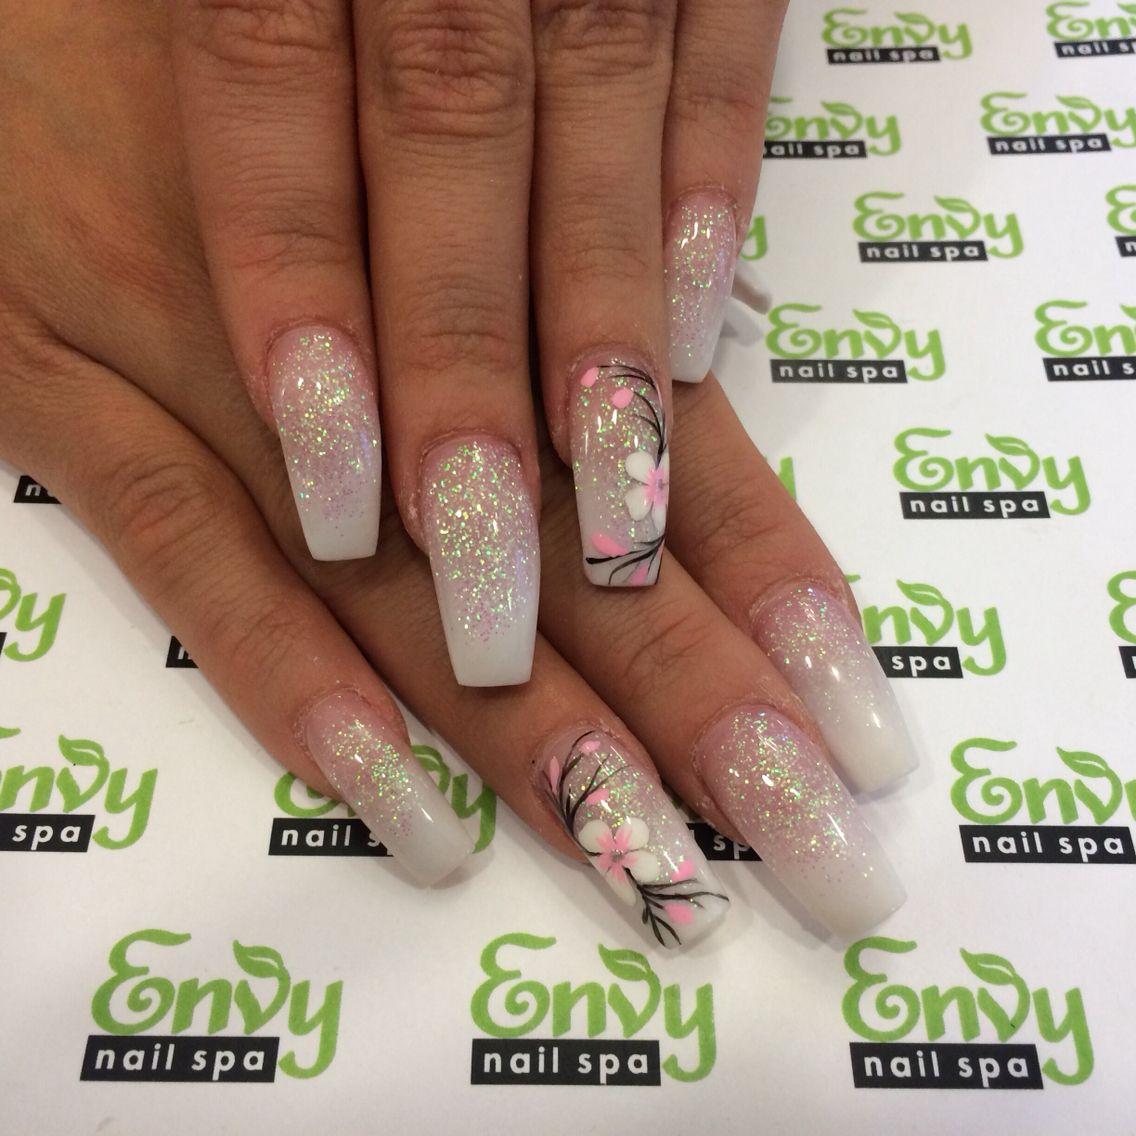 Pink White Flowers Glitter Nails Envy Nail Spa Nails Butterfly Nail Designs Nail Spa